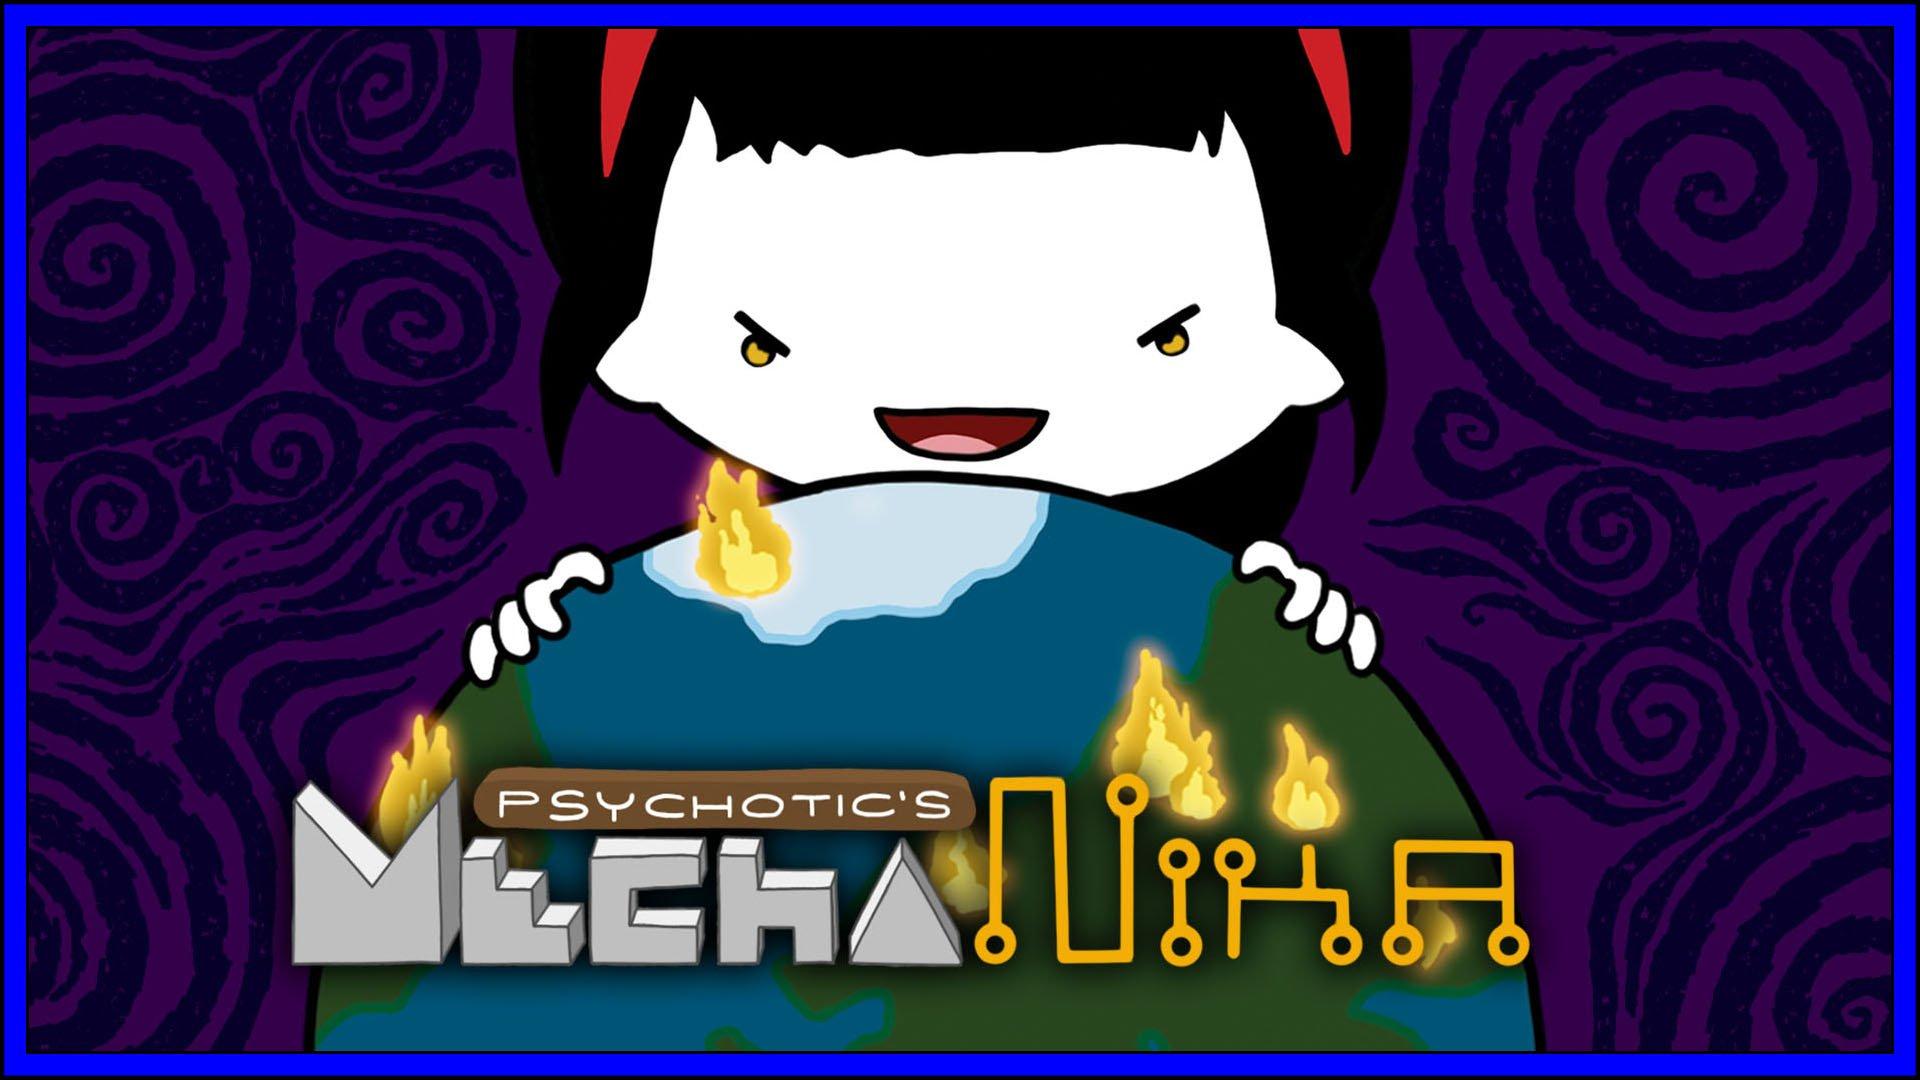 Psychotic's MechaNika (PS4) Review